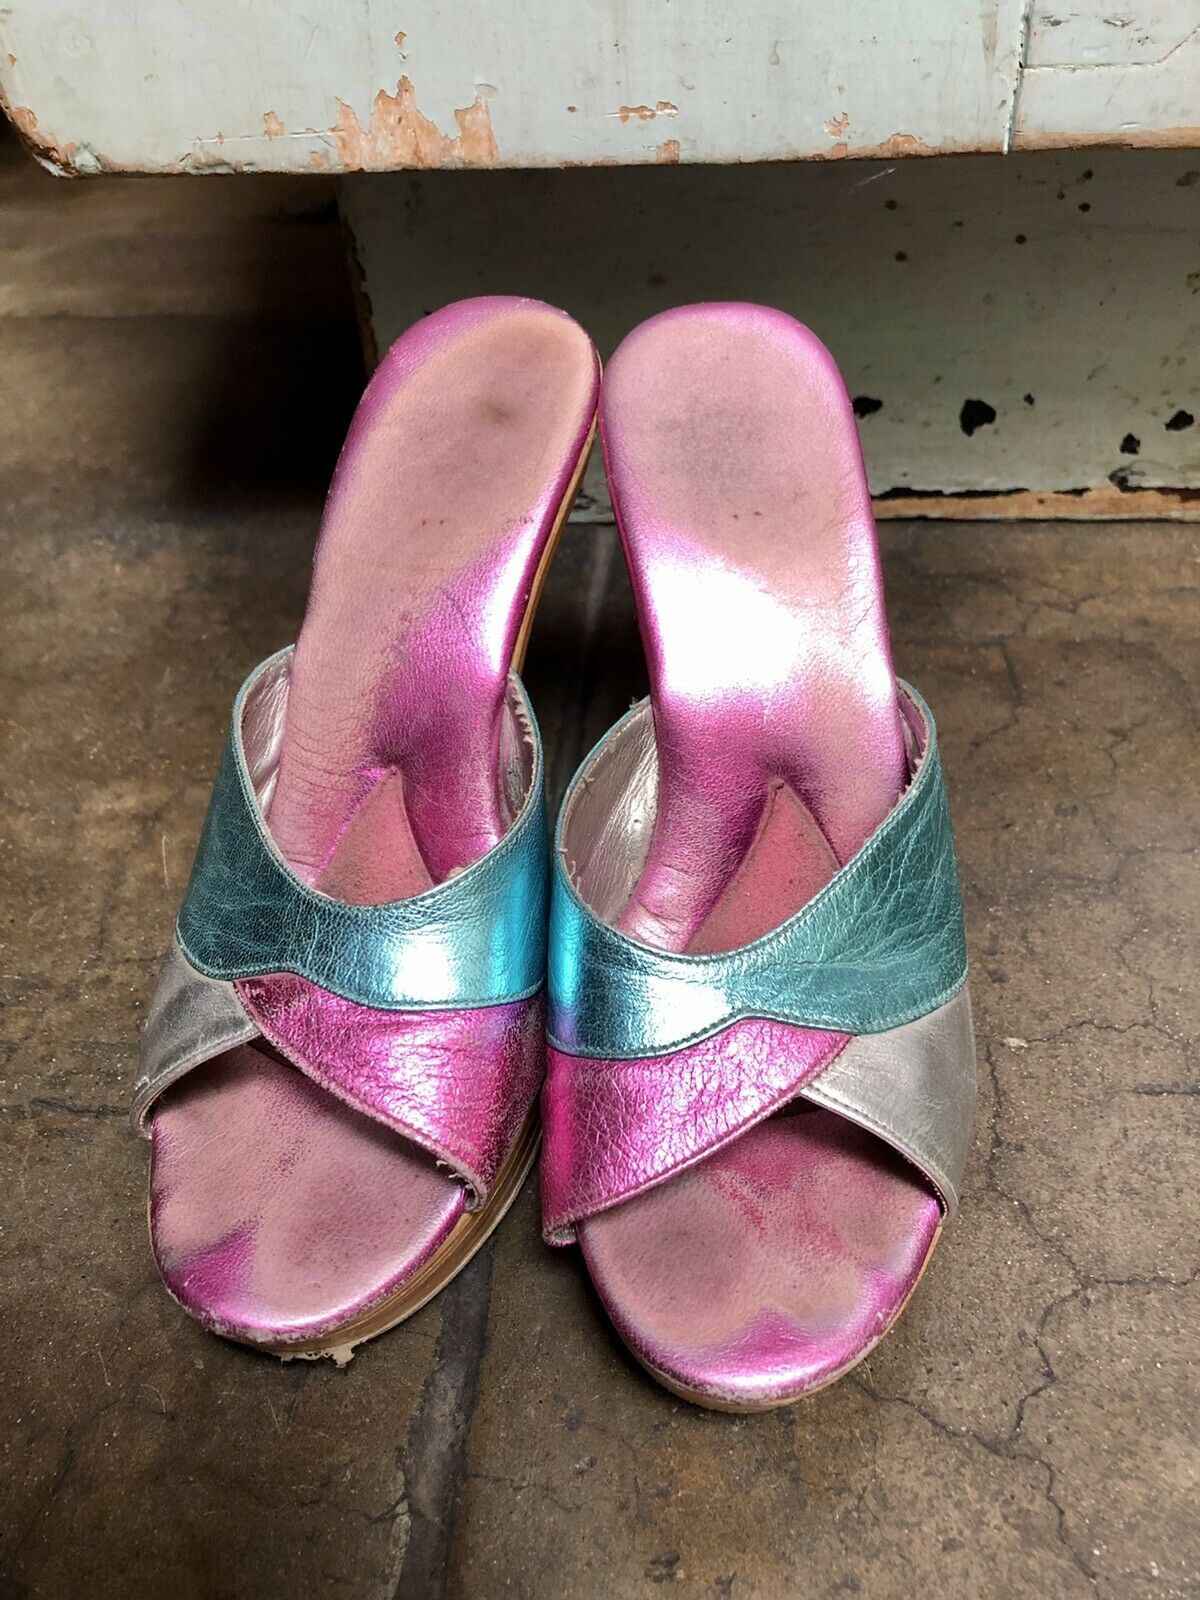 re-mix sandal - image 1